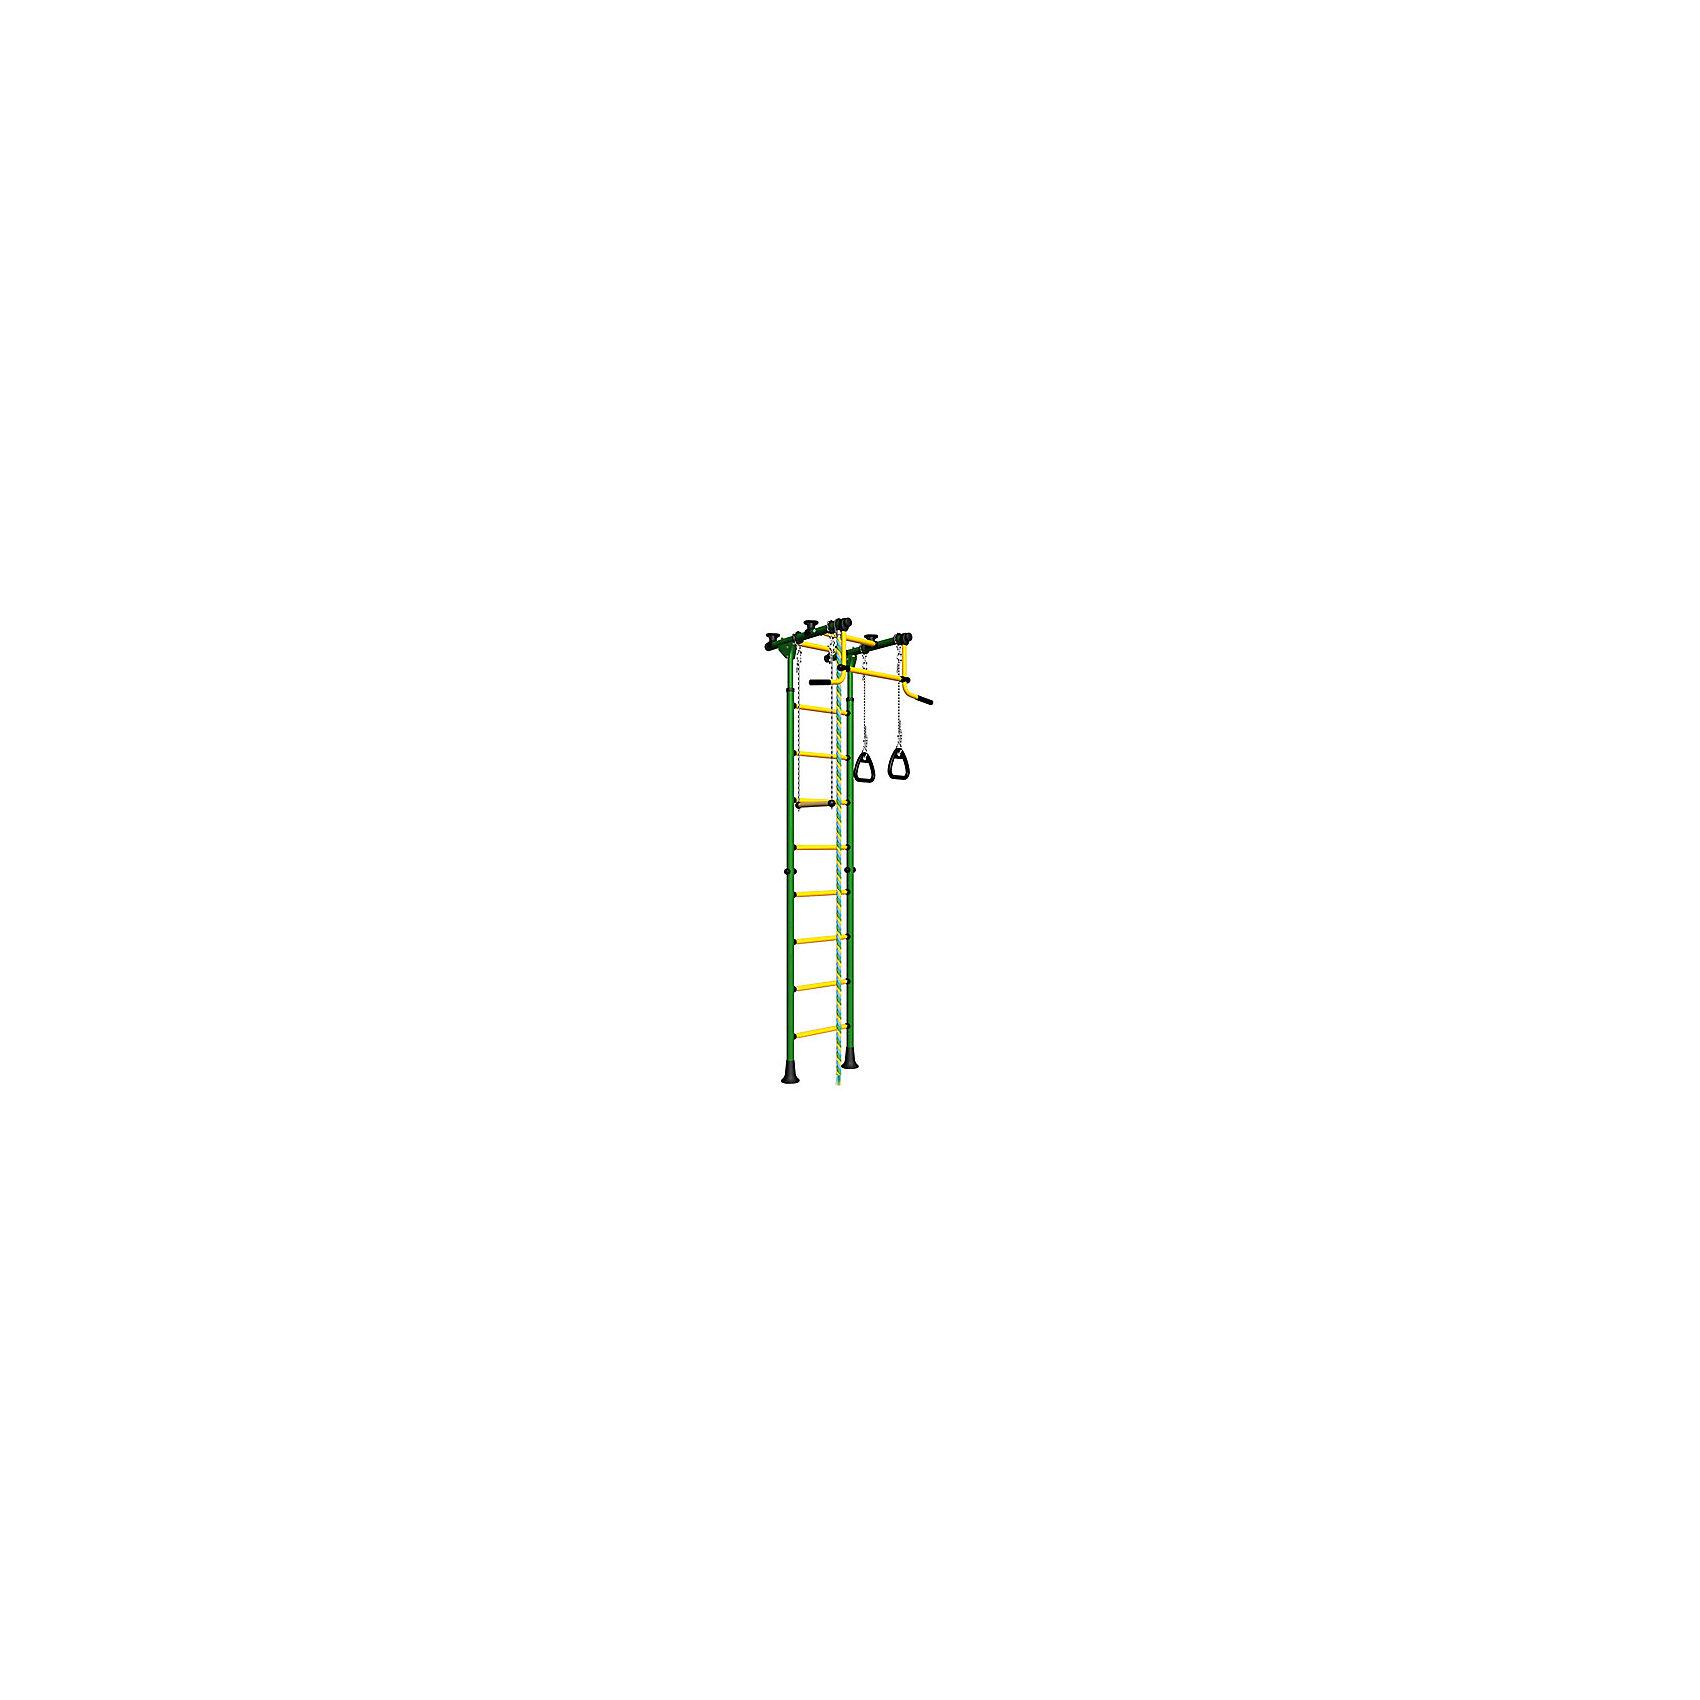 ROMANA Шведская стенка Комета-2, ROMANA, зеленый-желтый мягкие кресла romana пуфик макака